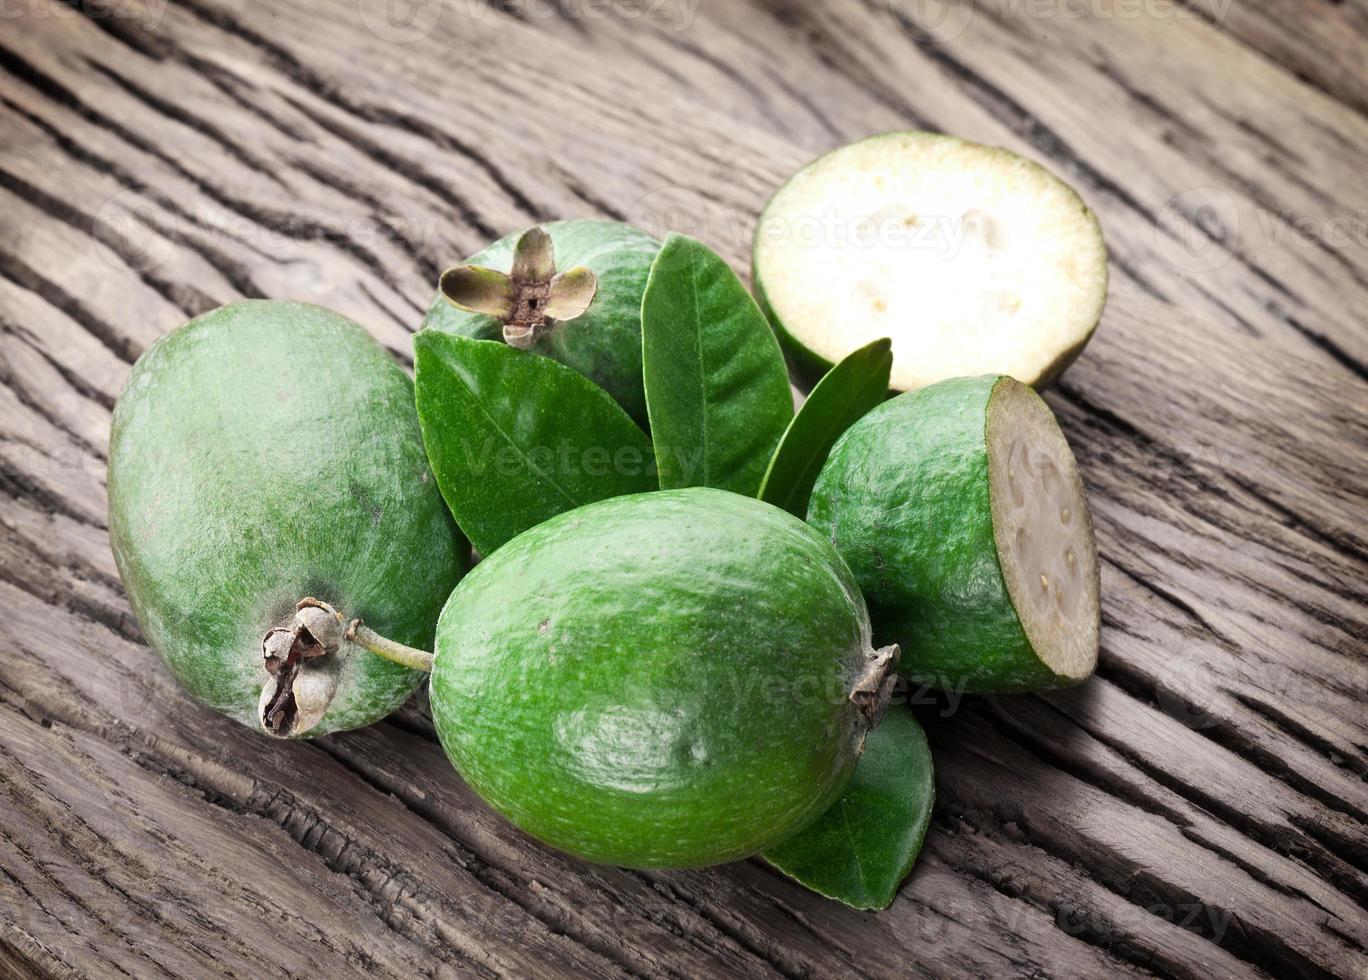 fruits feijoa. photo